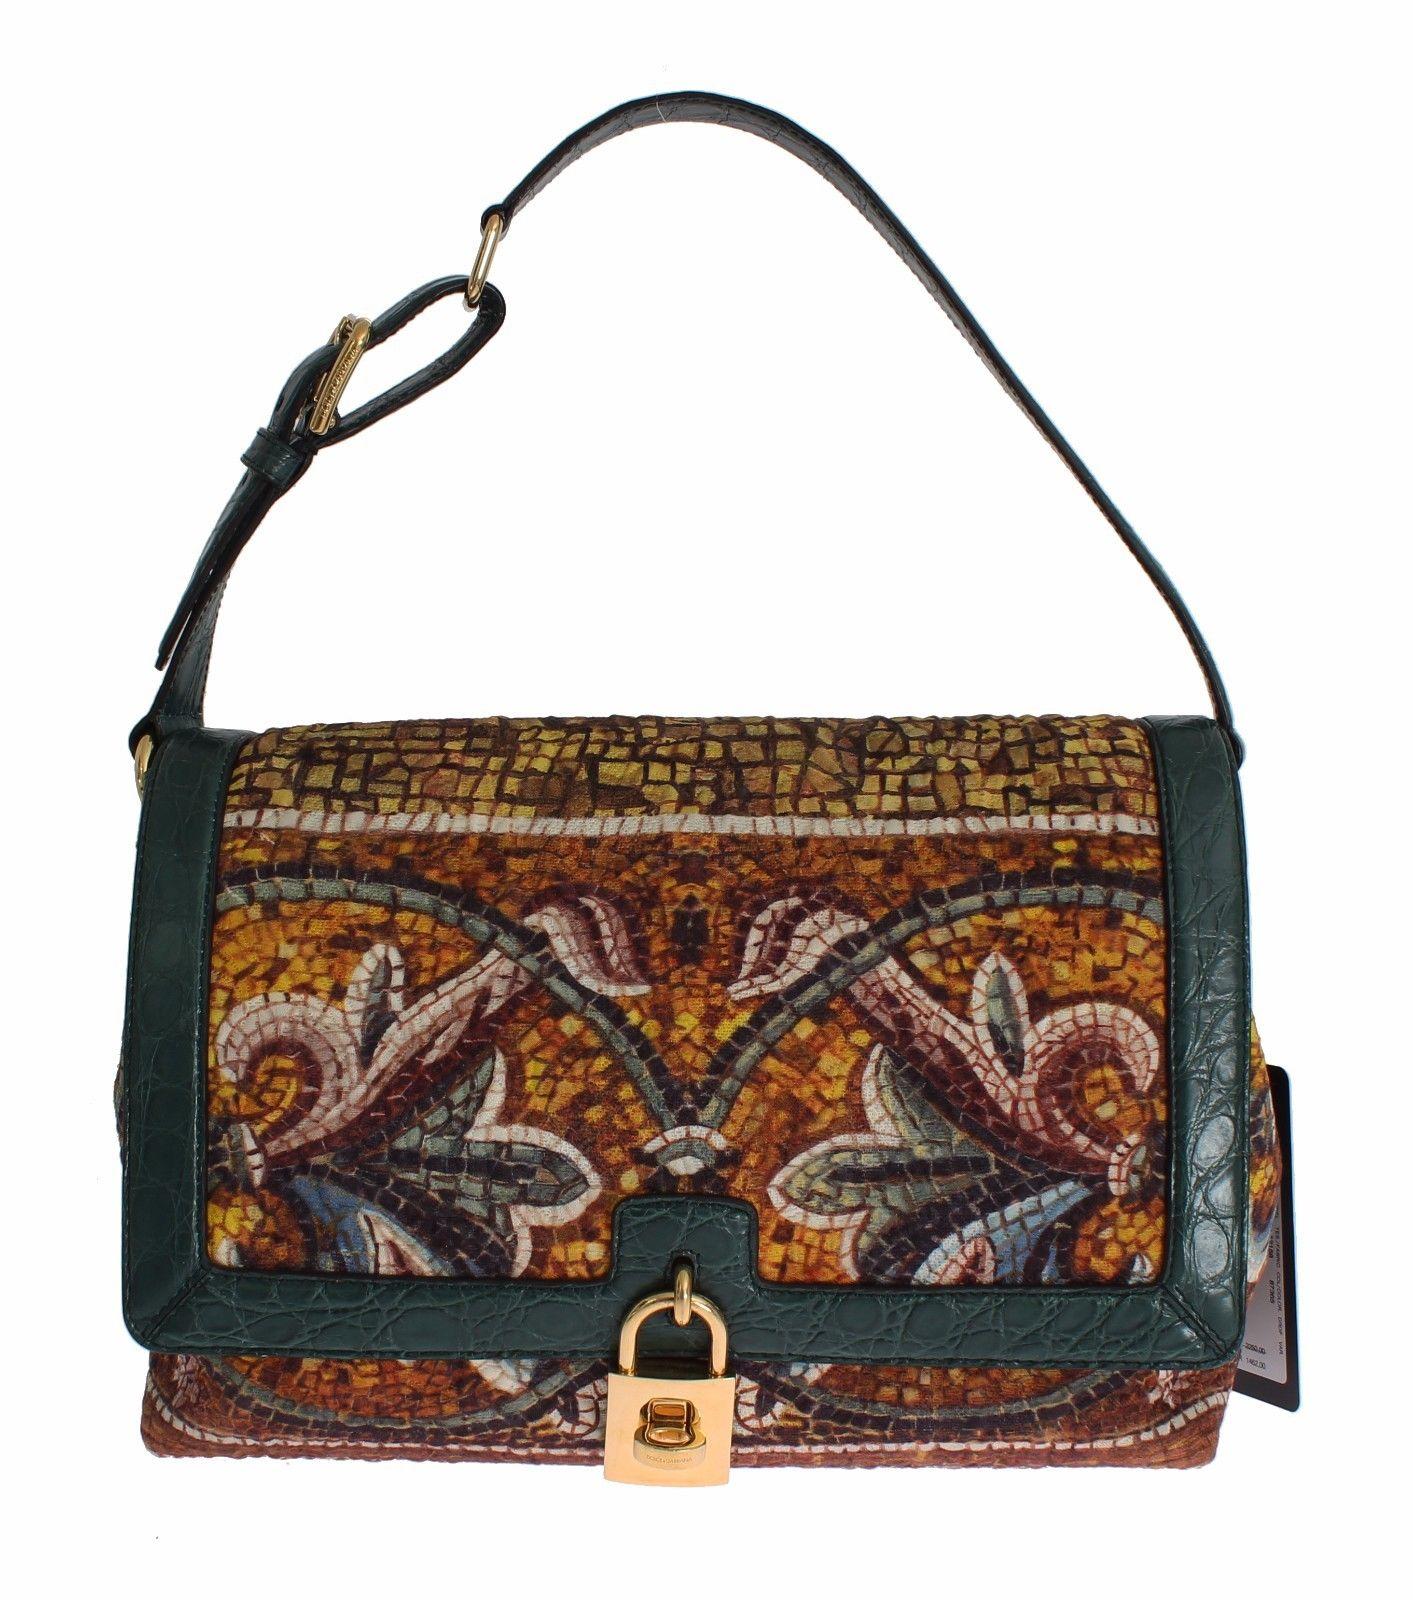 MISS BONITA Mosaic Brocade Crocodile Hand Shoulder Bag